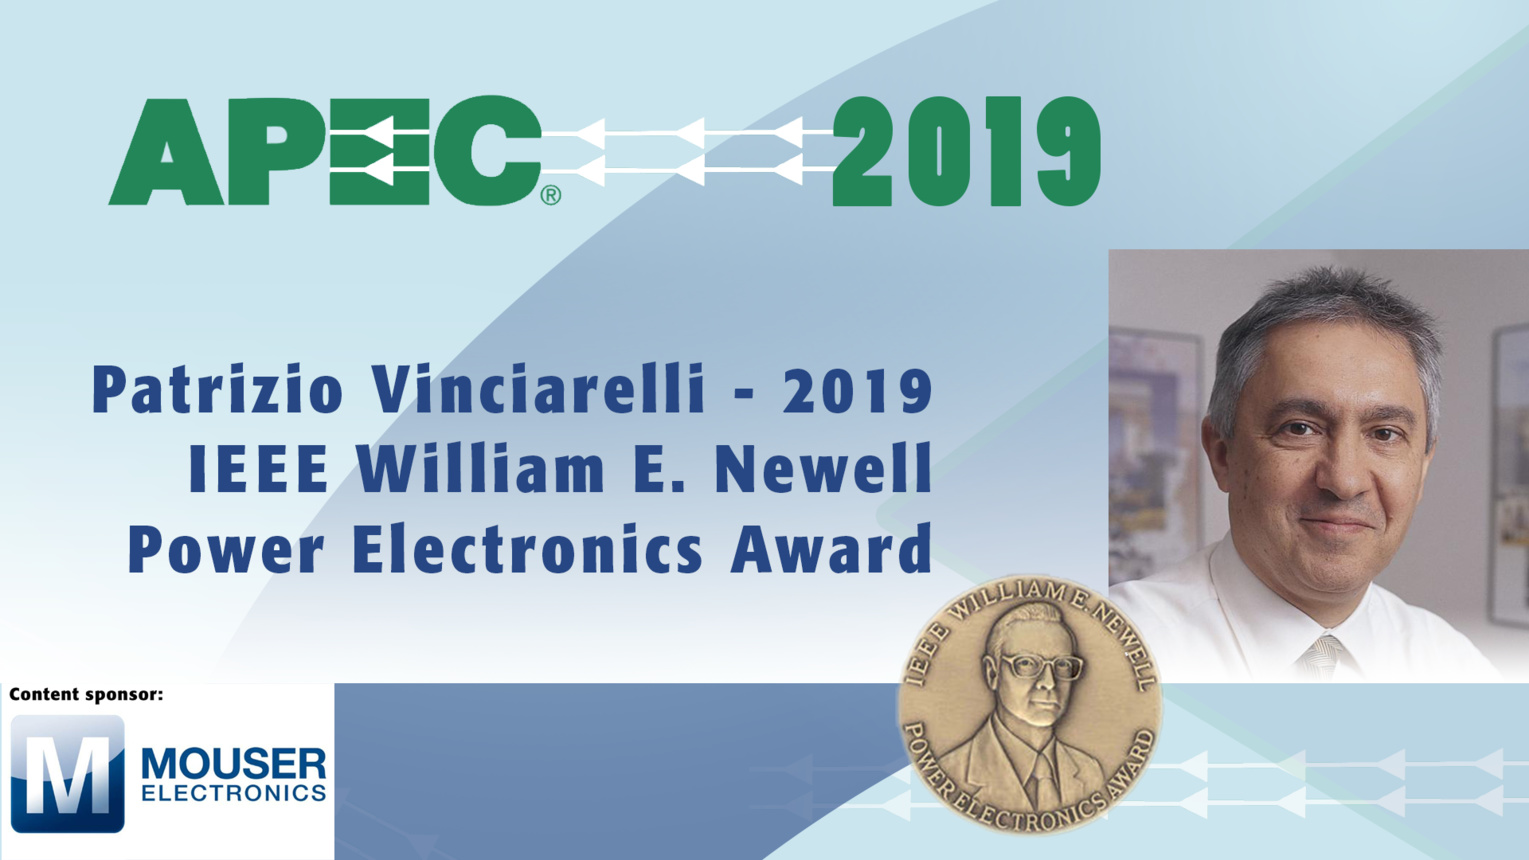 Patrizio Vinciarelli, Newell Award: APEC 2019